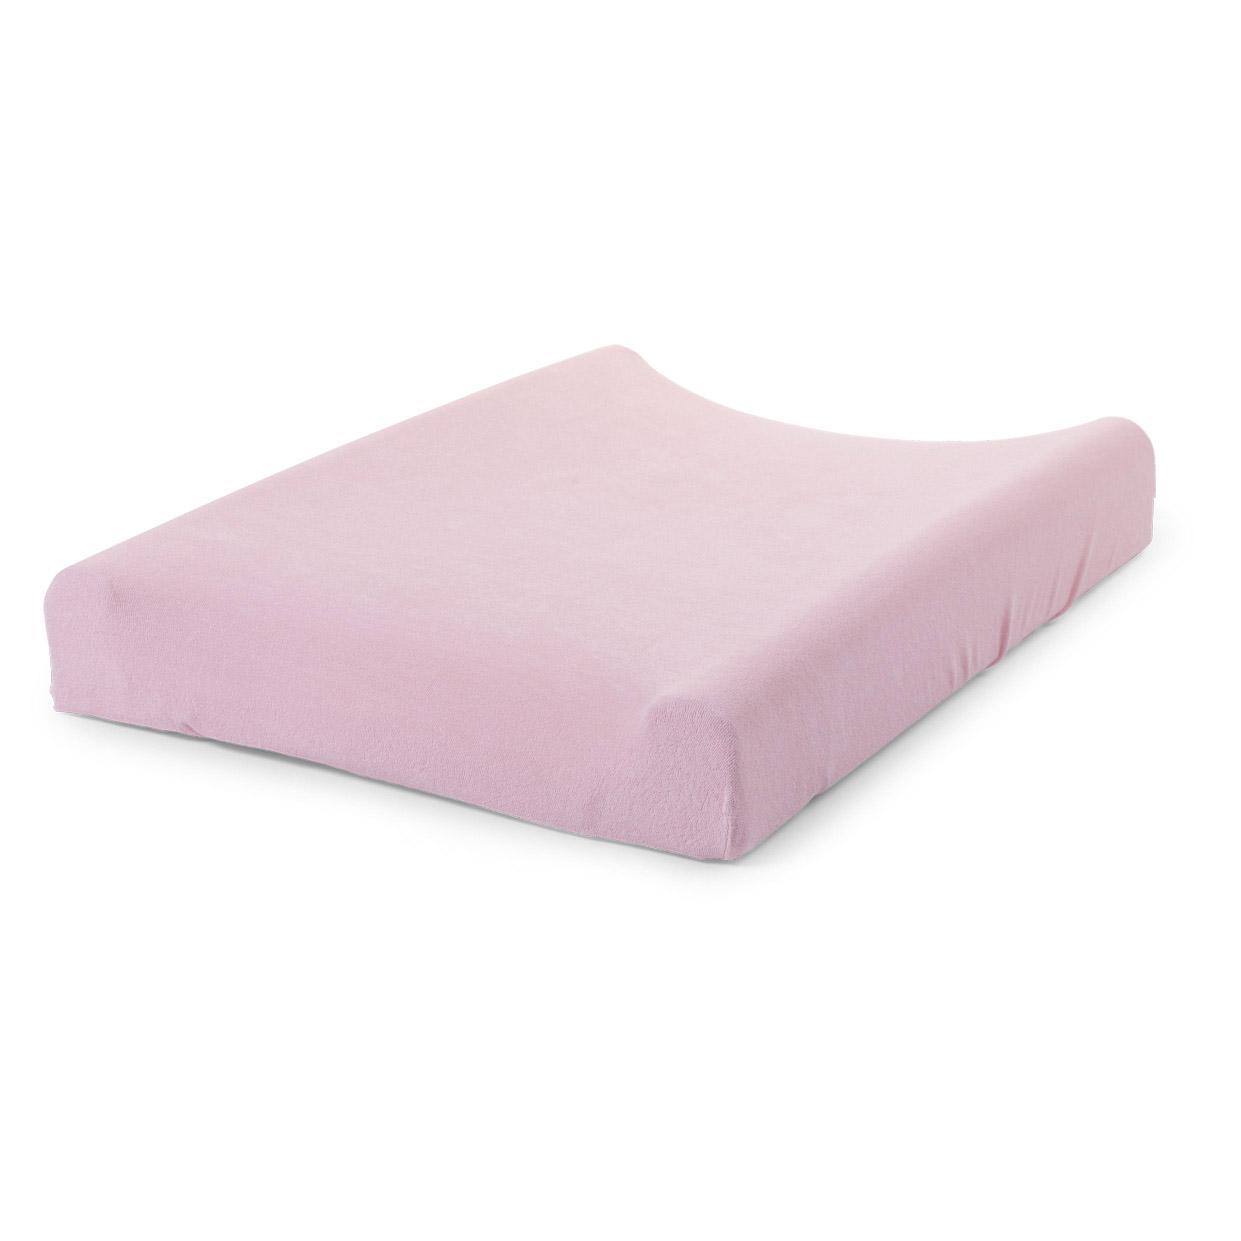 Husa pentru saltea de infasat Tricot Pastel Old Pink 180g imagine